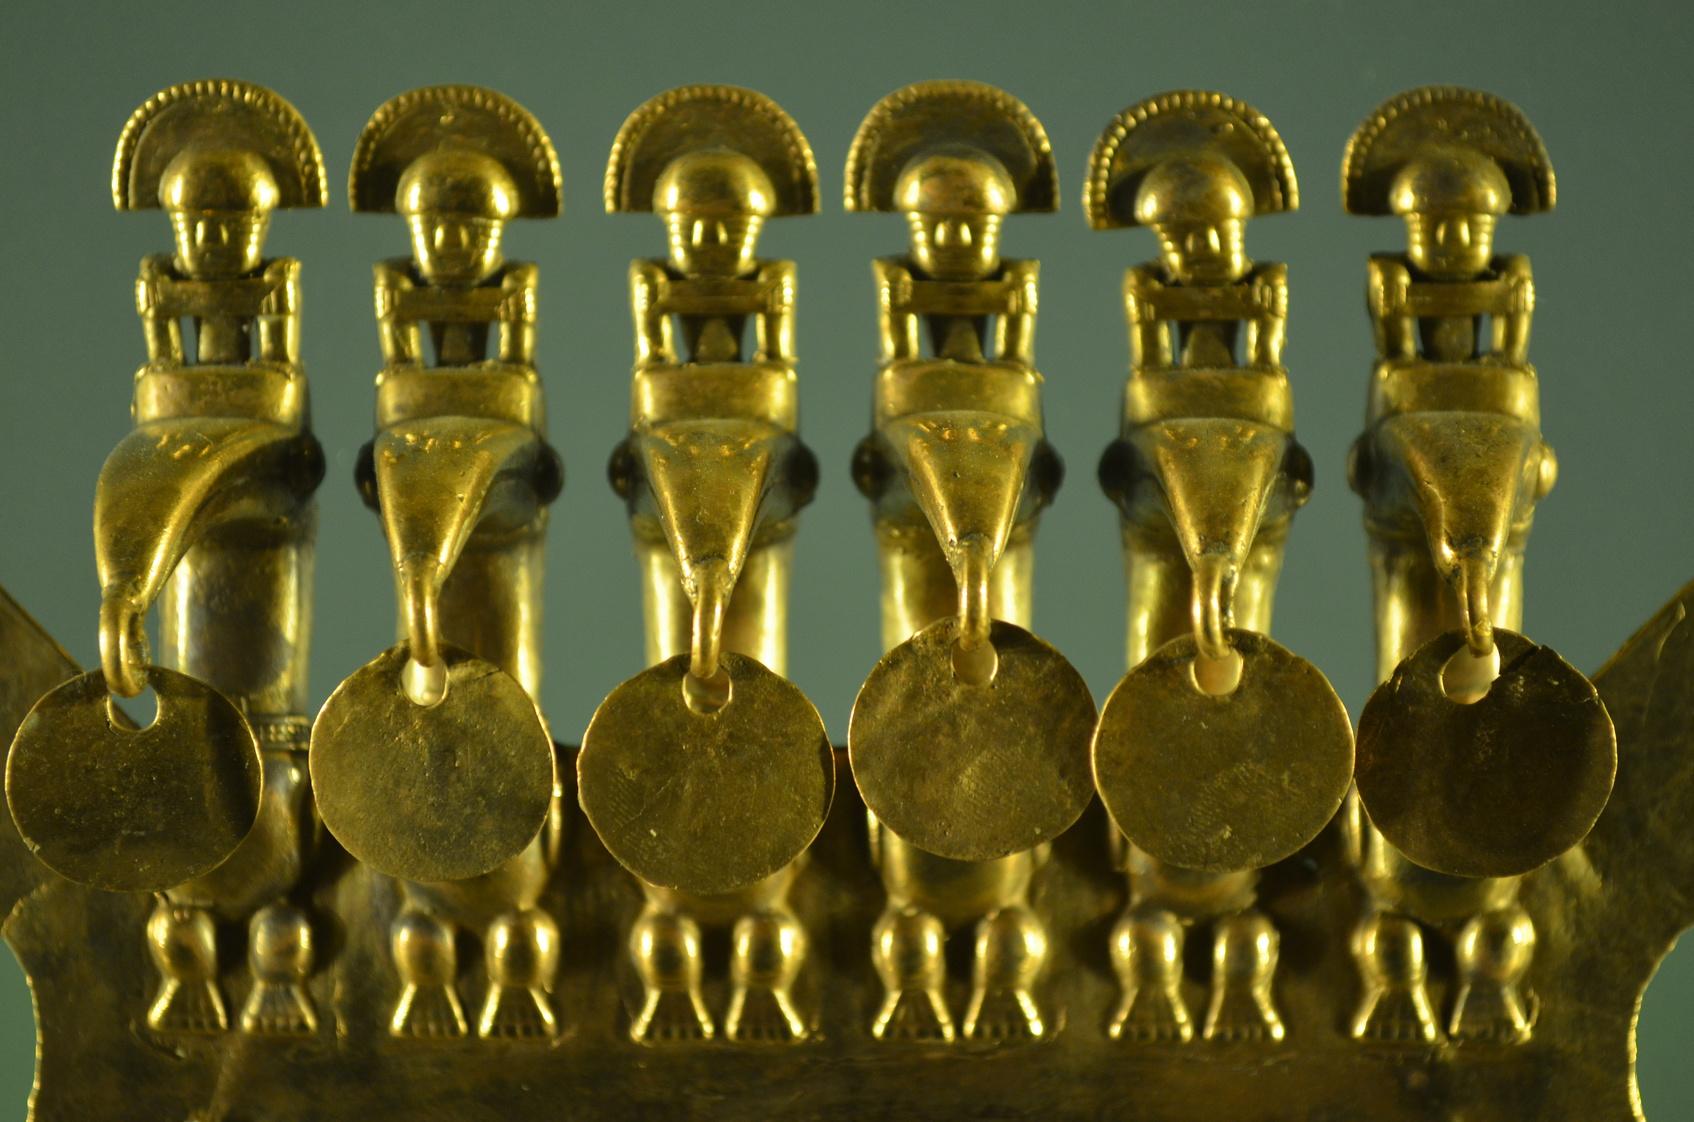 Foto: Museu do Ouro/ Mark (Fotolia)